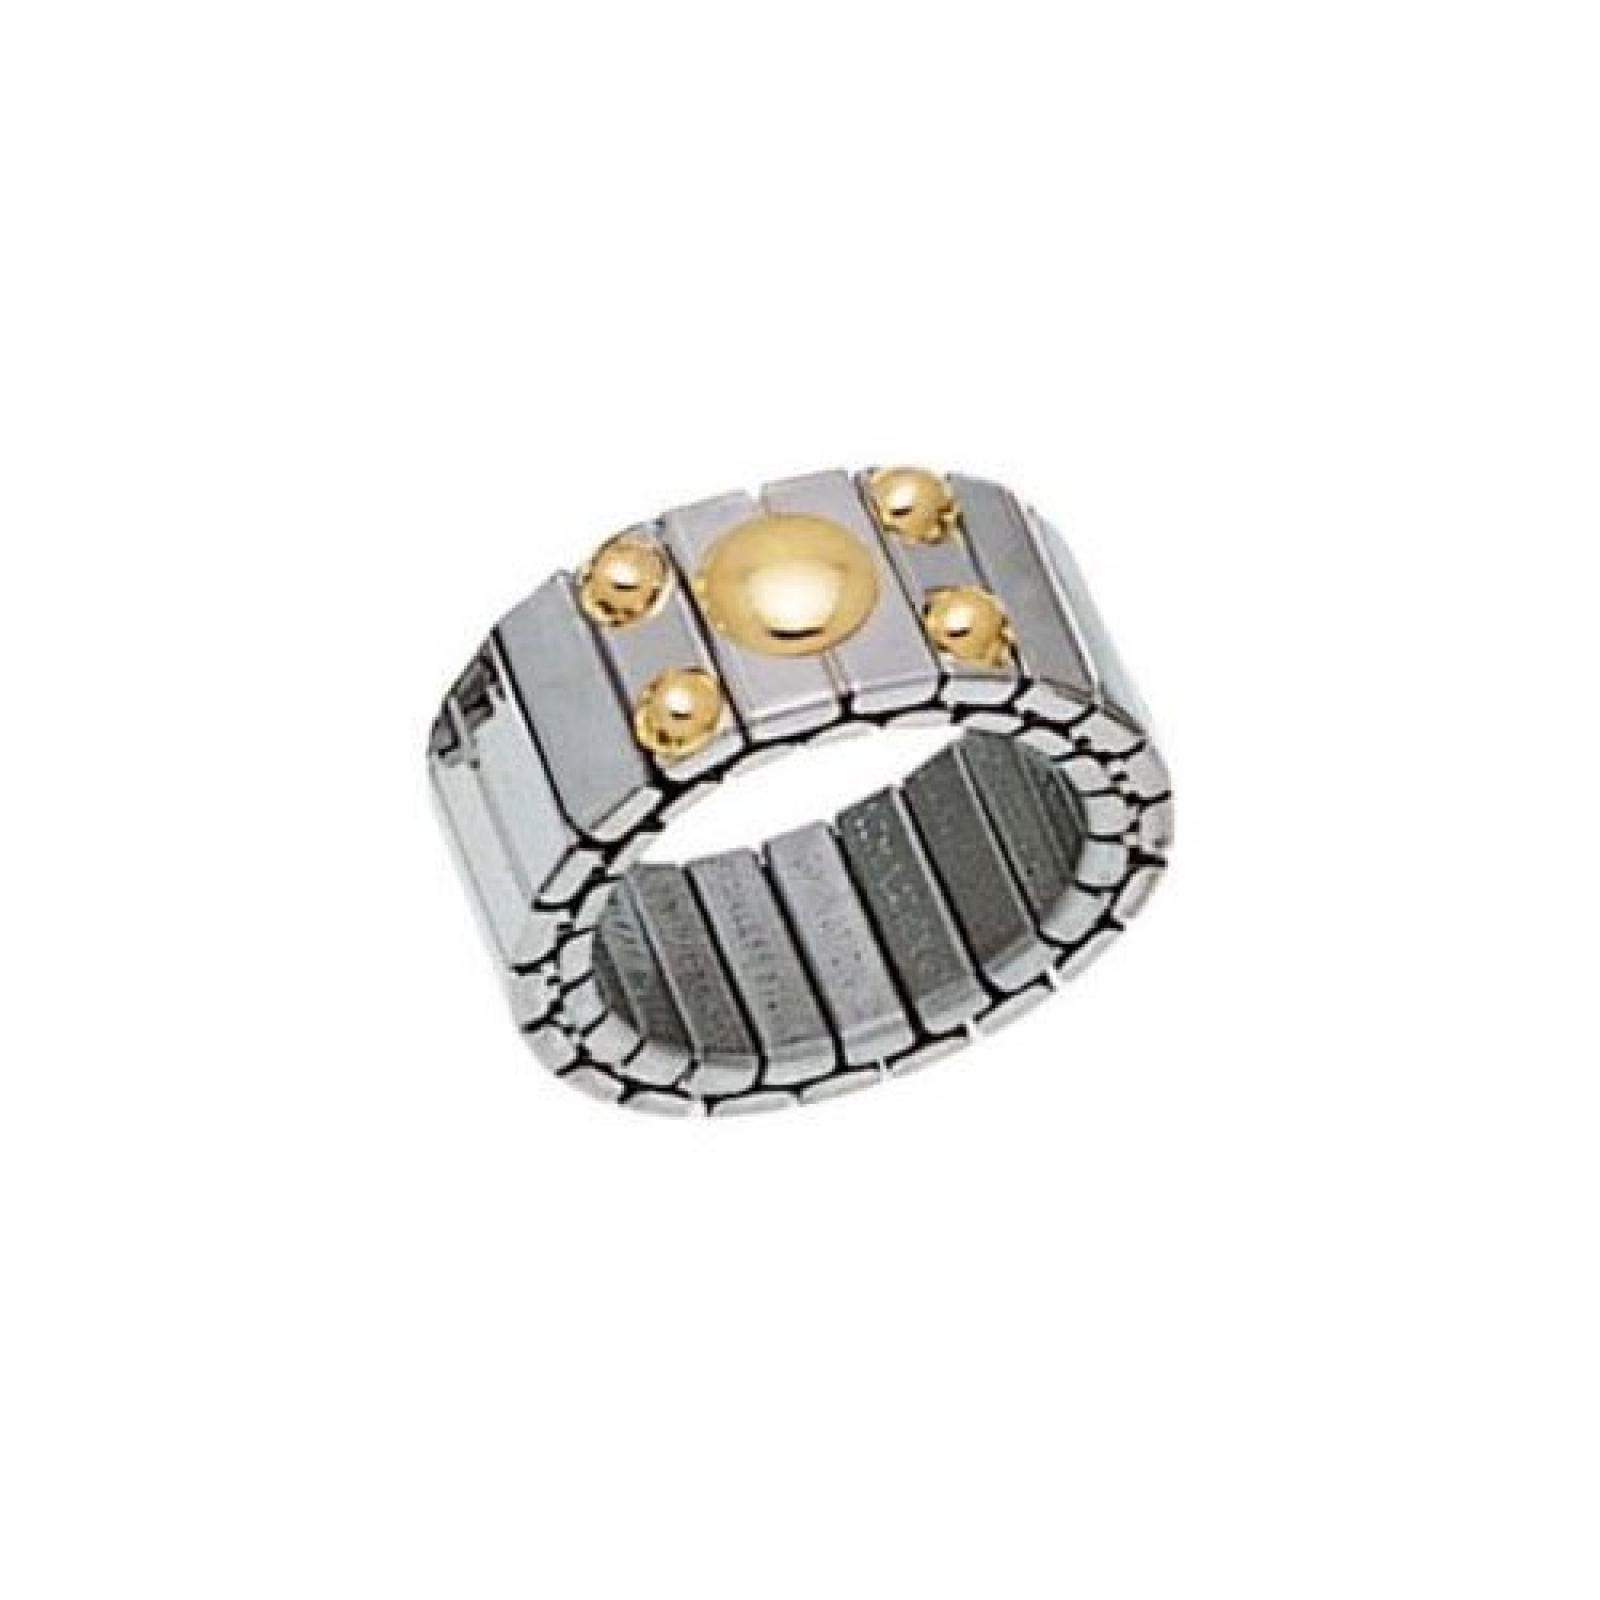 Nomination Damen-Ring Mittel Mit 1 Symbol Kugelchen Ring größe variabel 040020/008